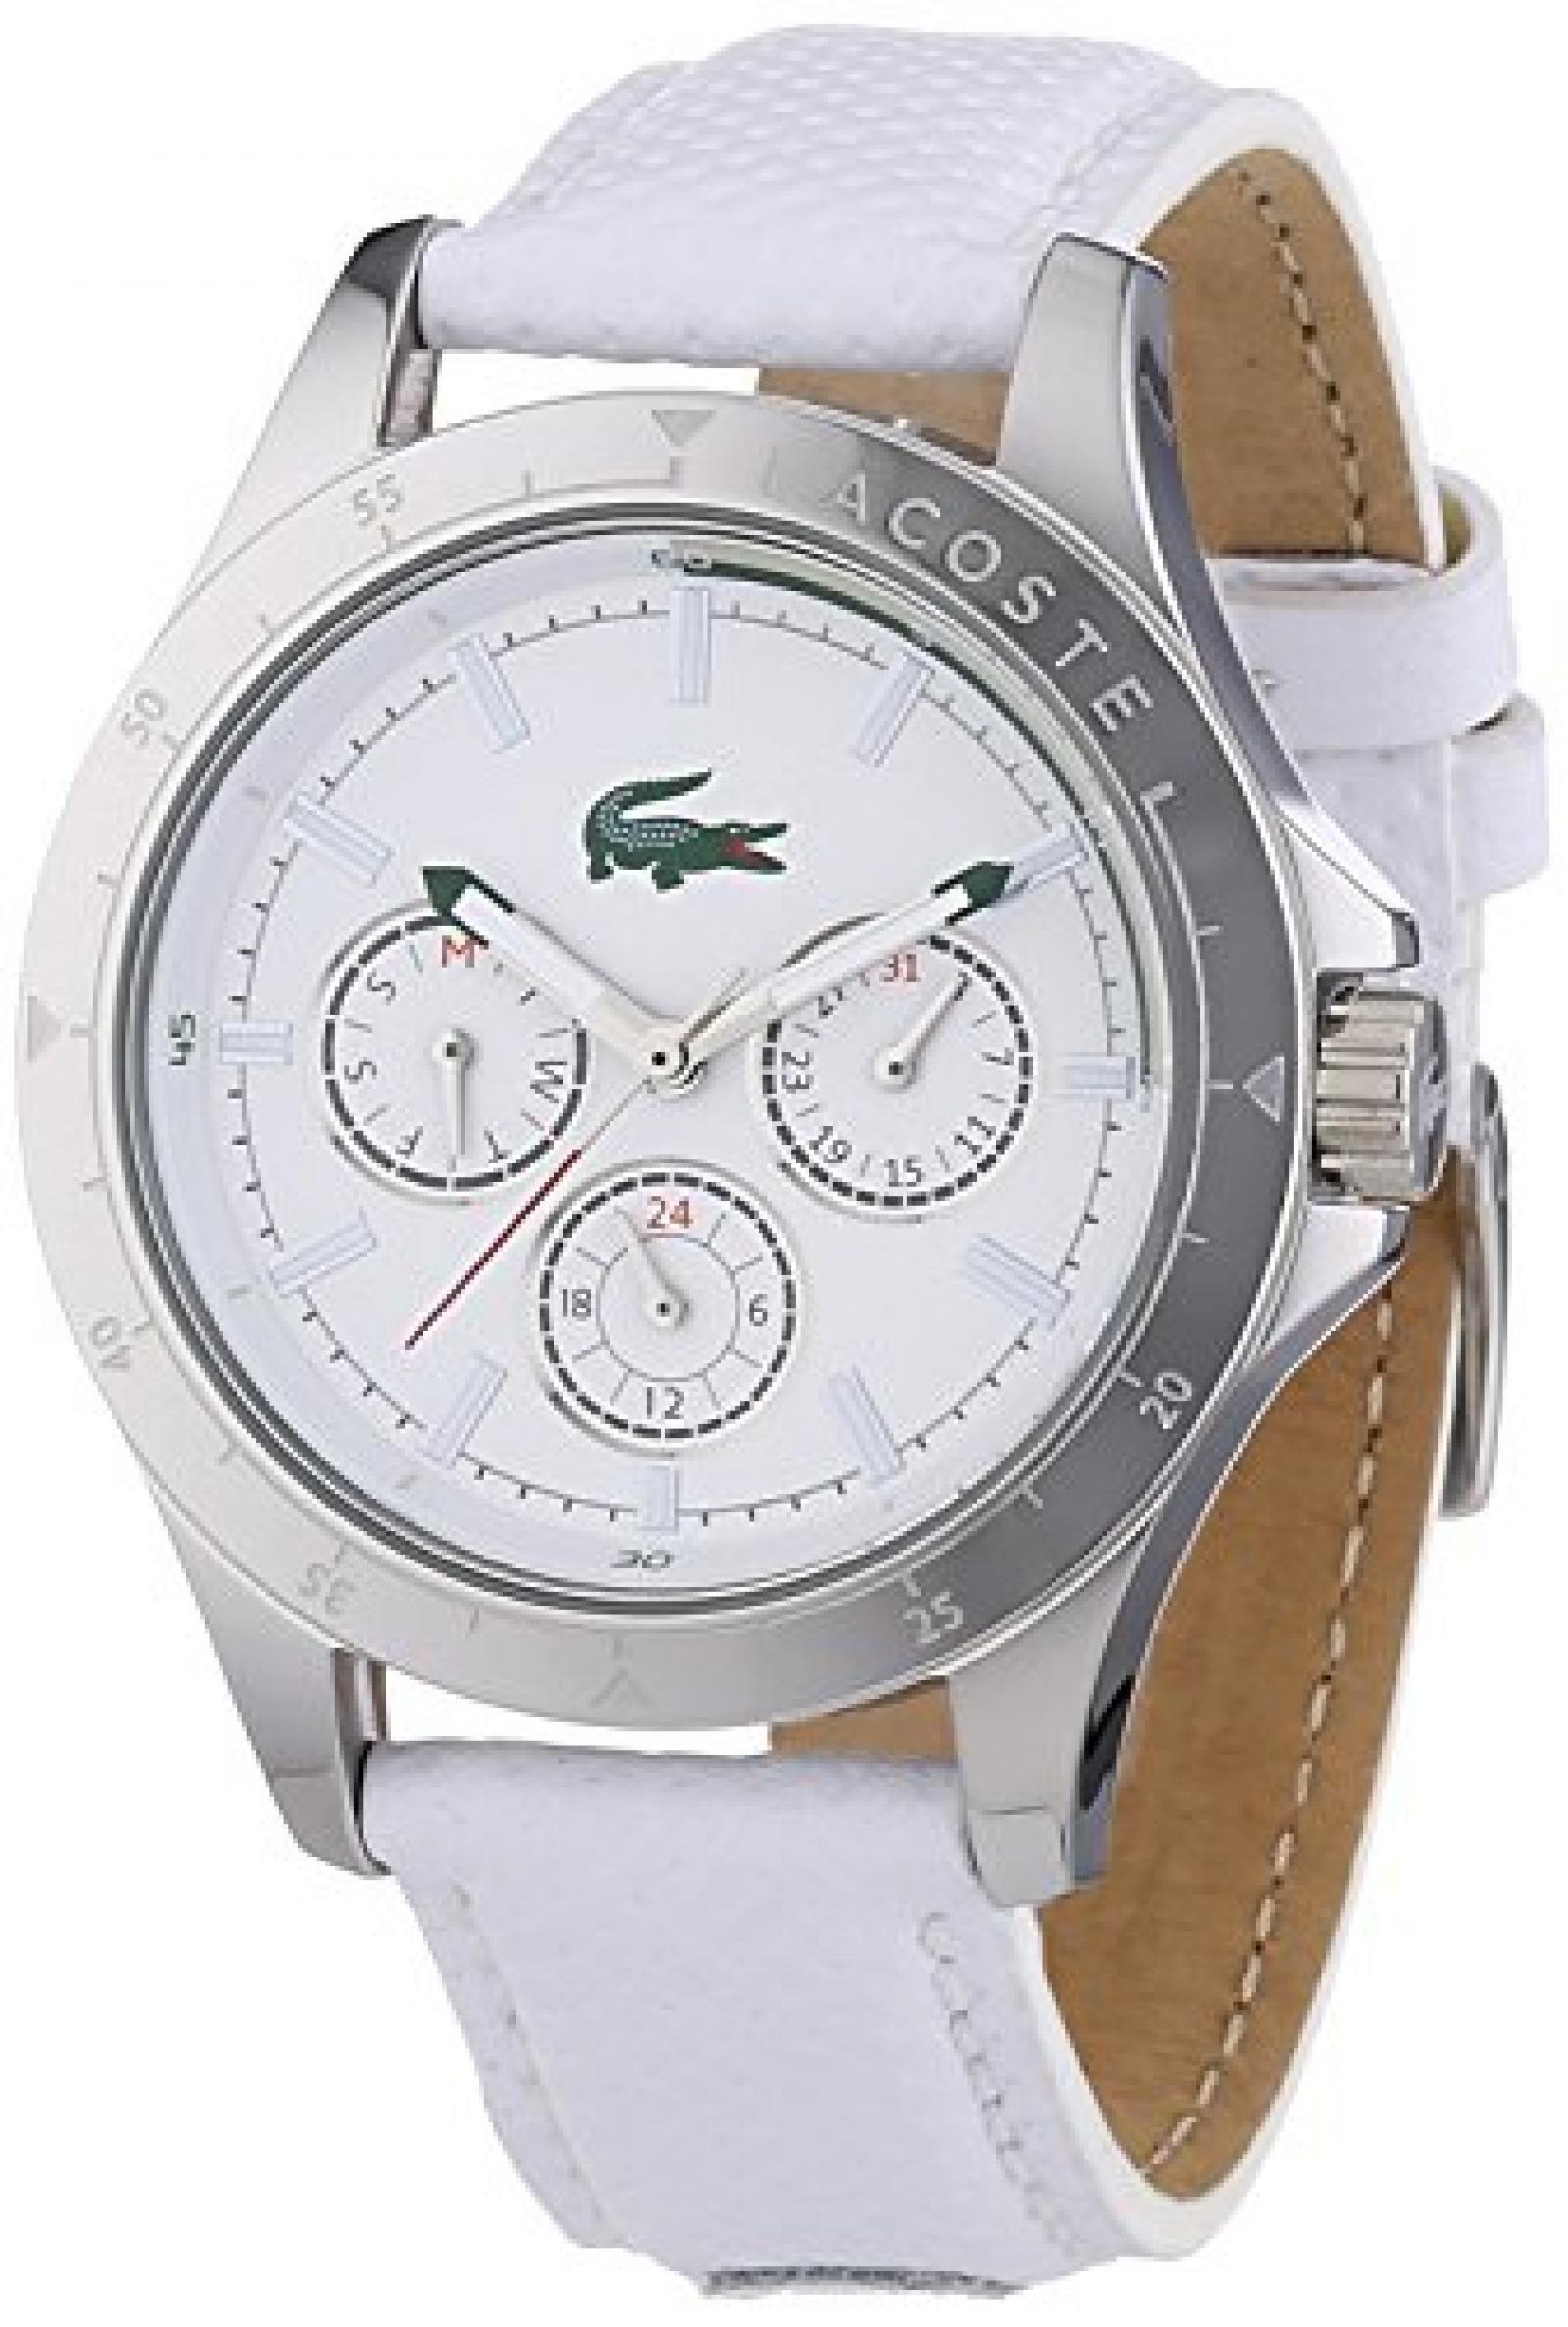 Lacoste Damen-Armbanduhr MACKAY Analog Quarz Leder 2000846